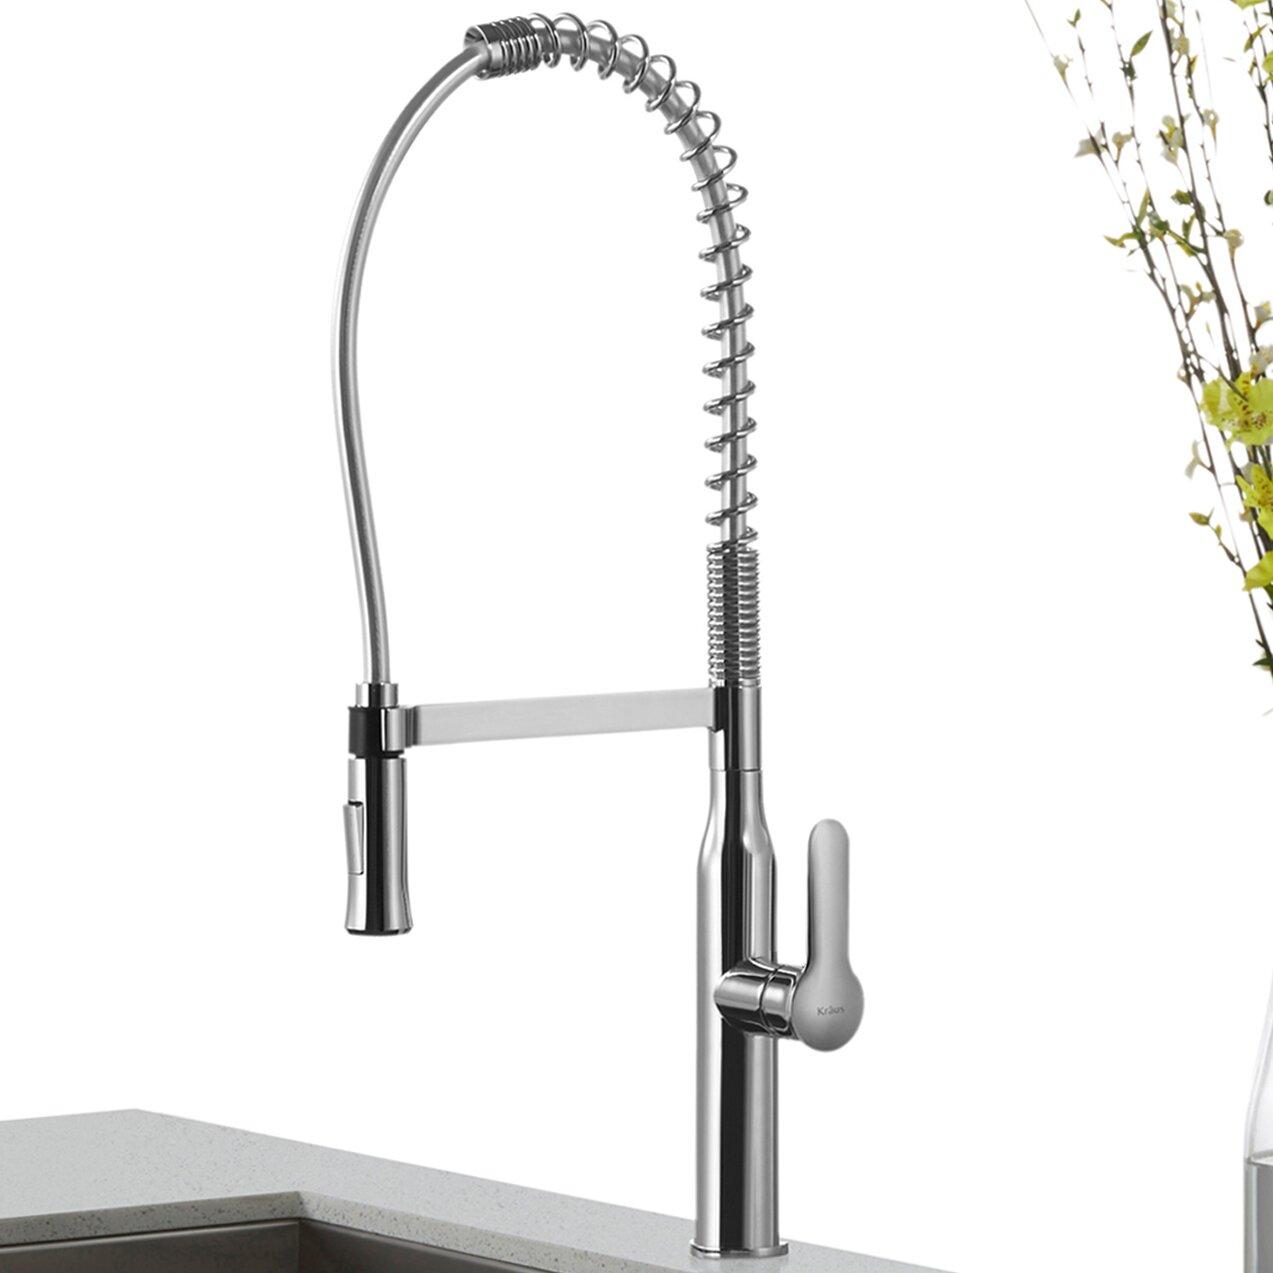 Kraus Nola Single Lever Commercial Style Kitchen Faucet Reviews